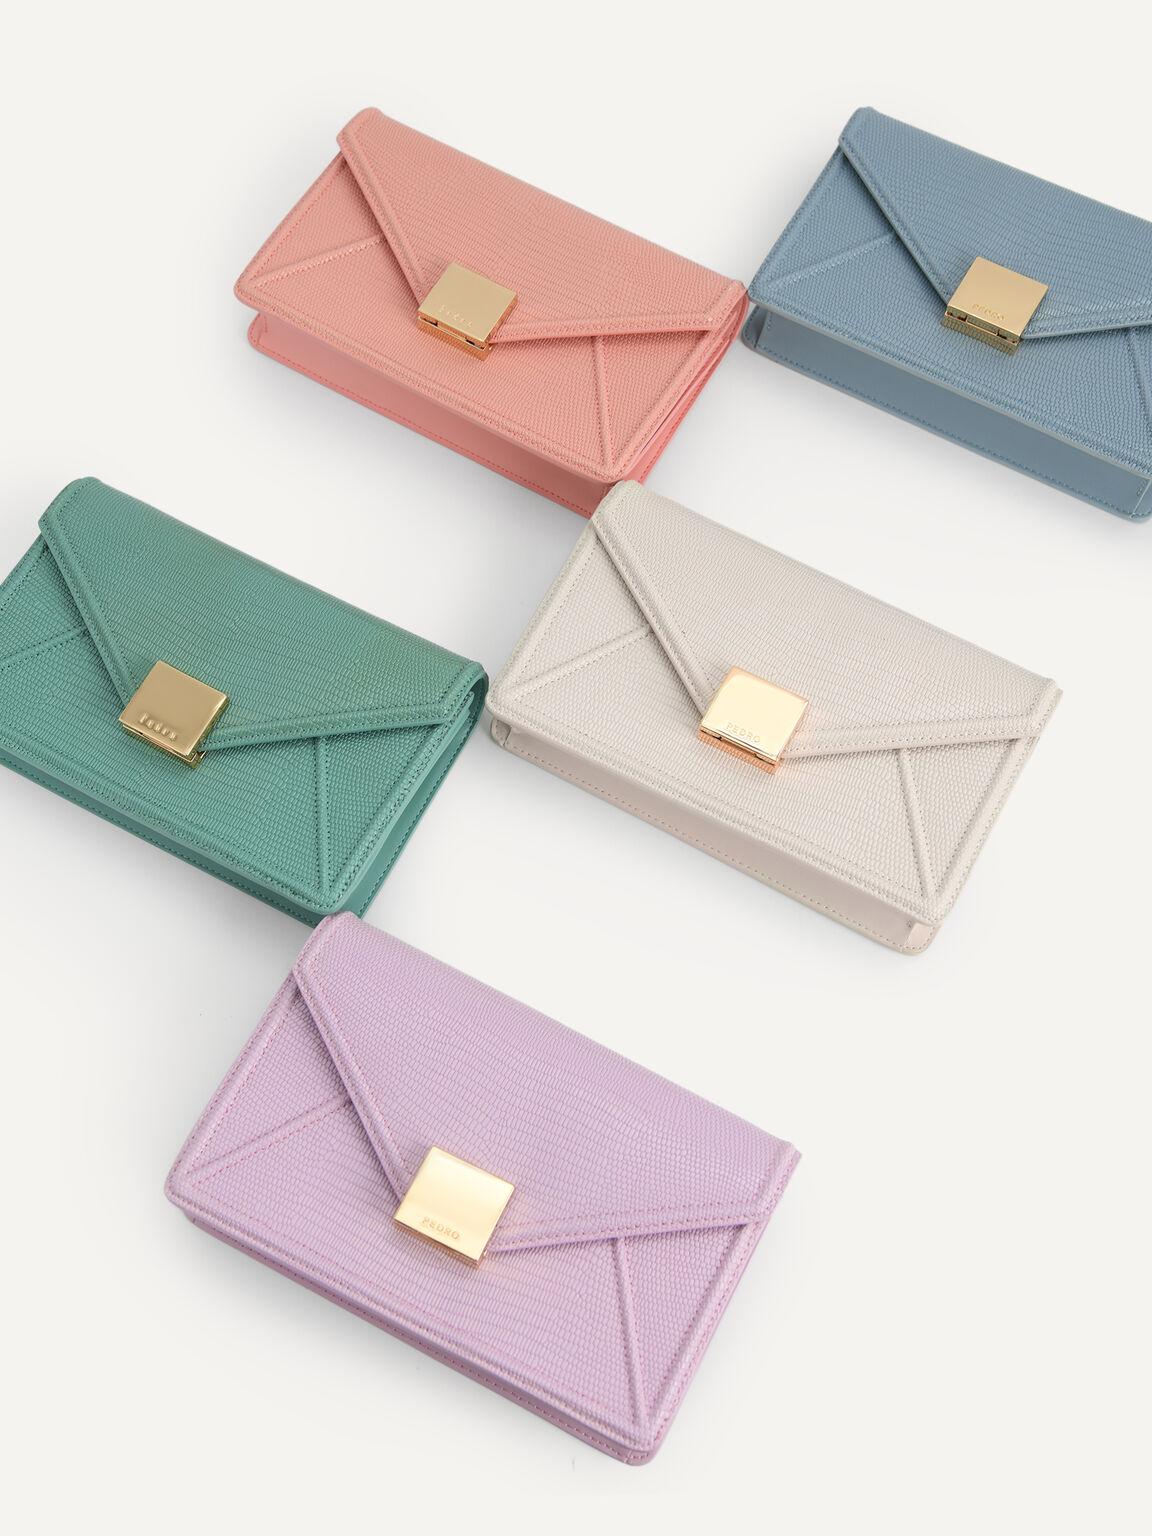 Lizard-Effect Leather Envelope Travel Organizer, Blue, hi-res